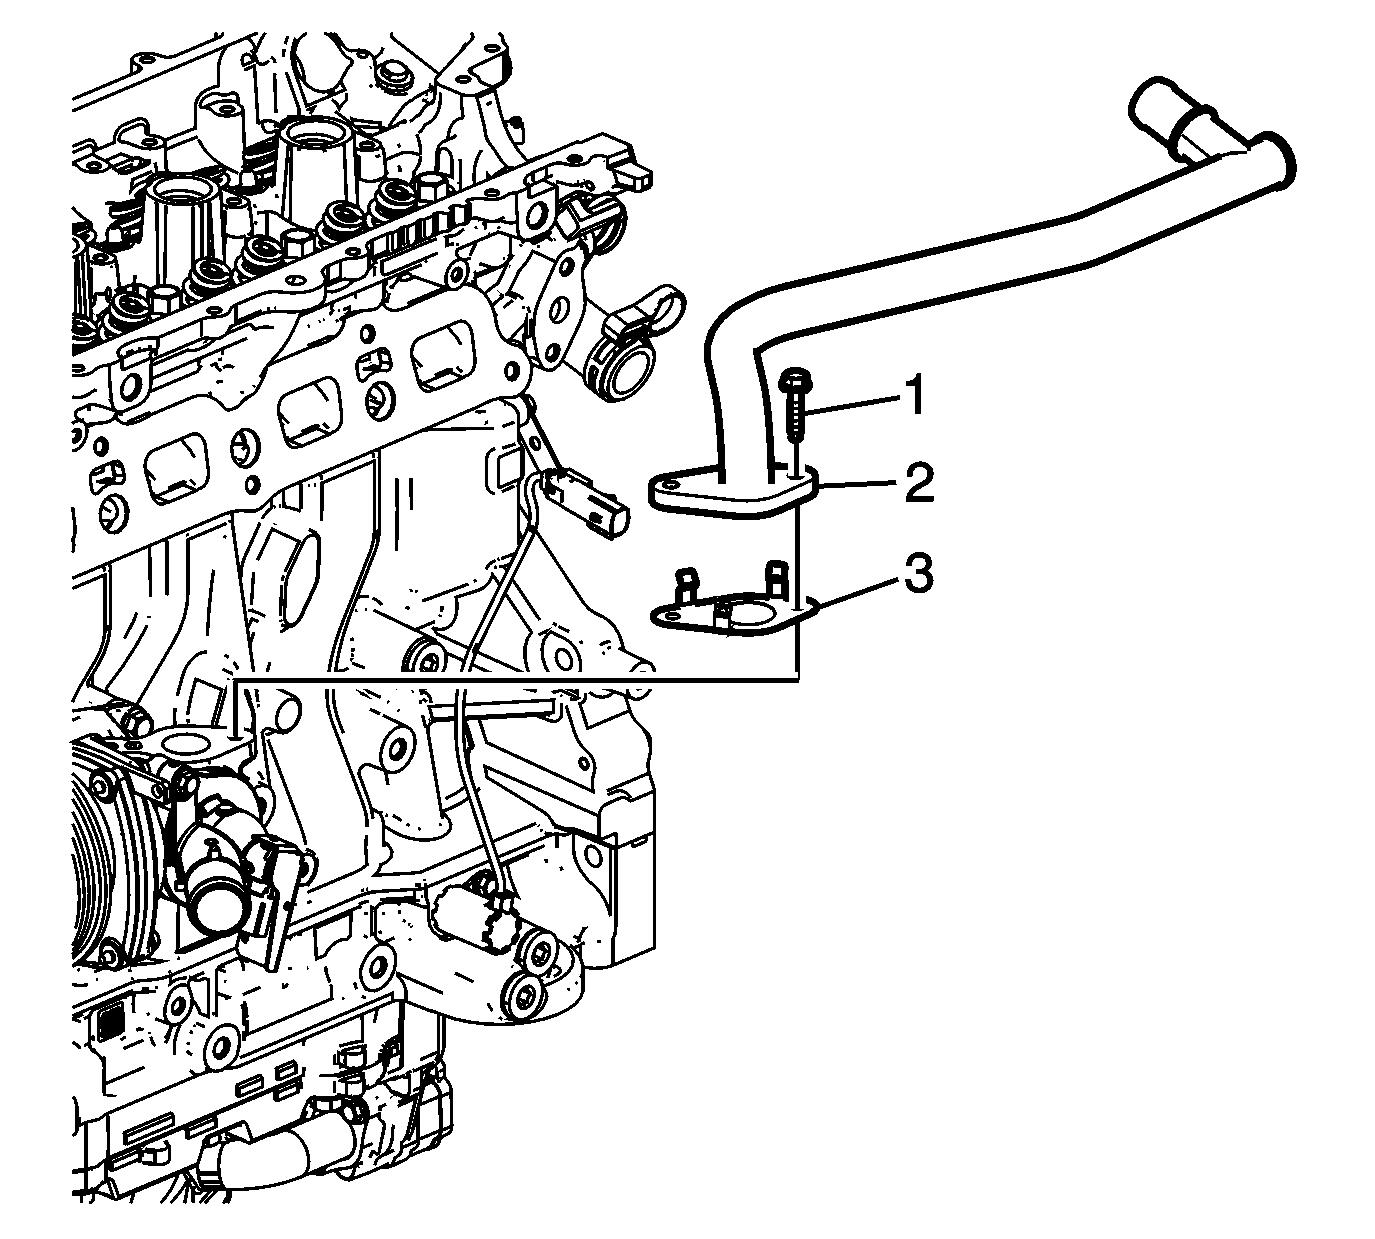 2013 chevrolet malibu engine diagram xv 1027  2013 chevy malibu engine diagram download diagram  chevy malibu engine diagram